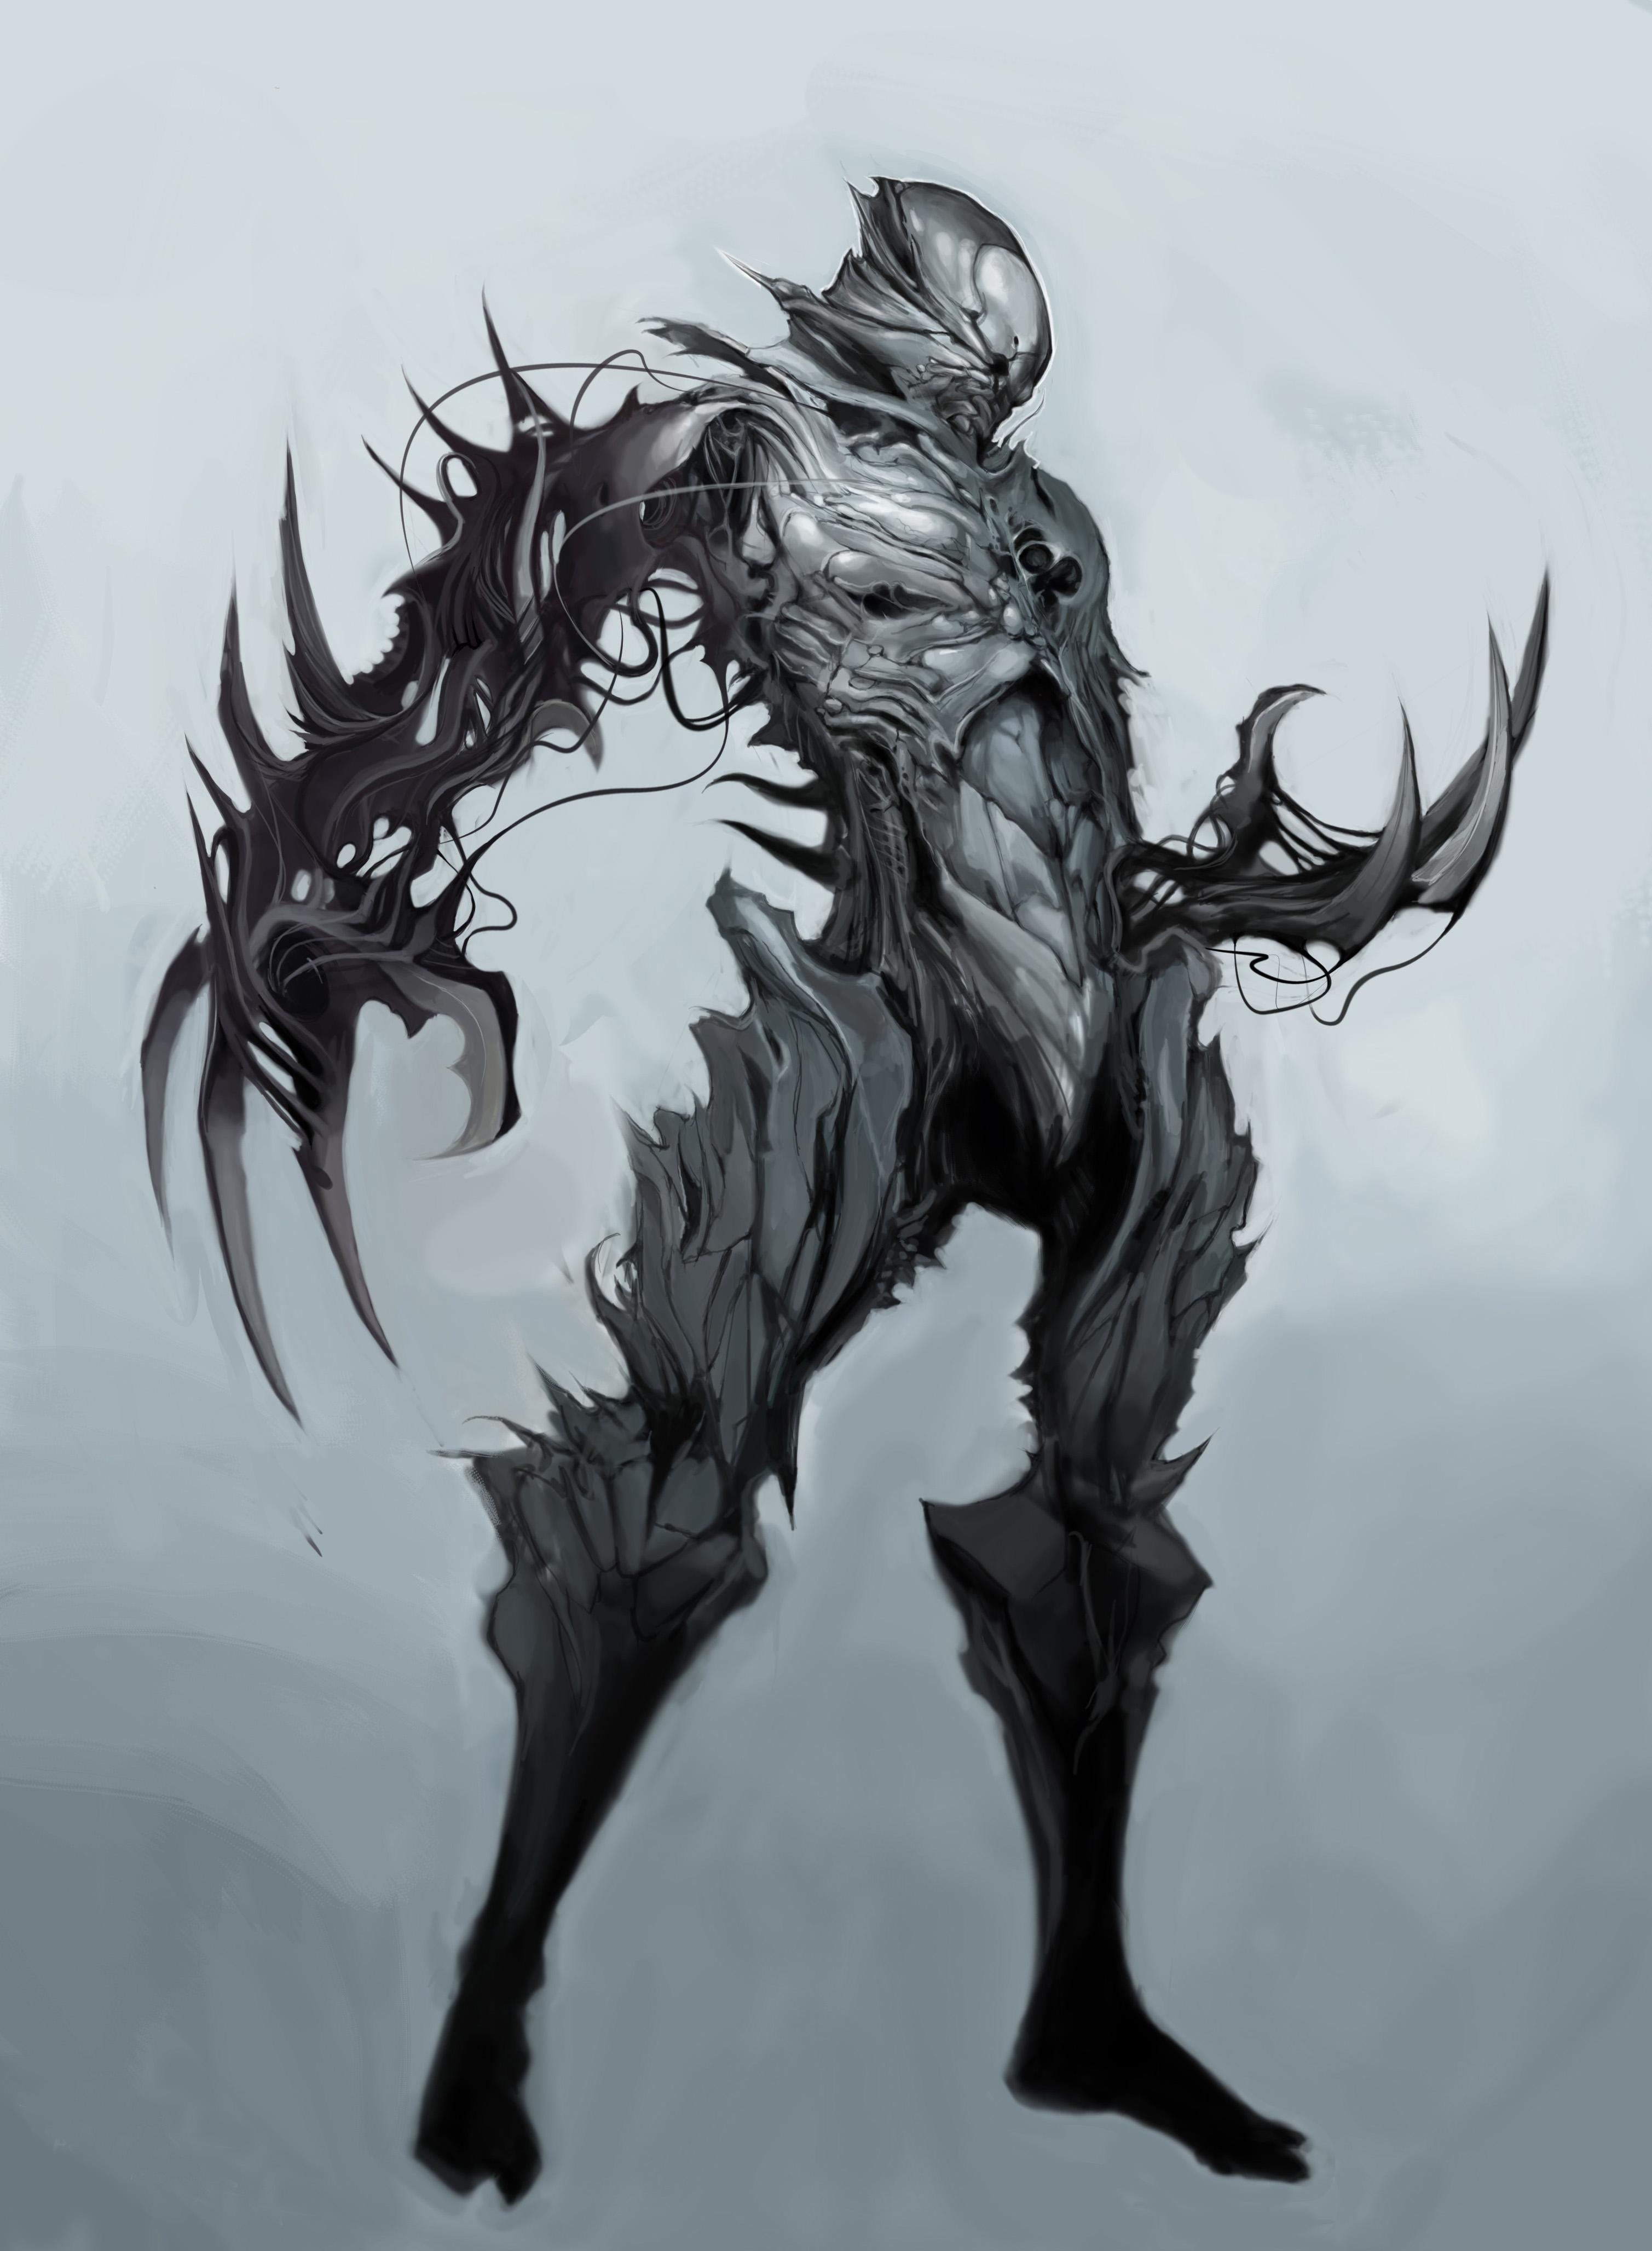 3018x4112 Wallpaper Drawing, Illustration, Monochrome, Knight, Demon